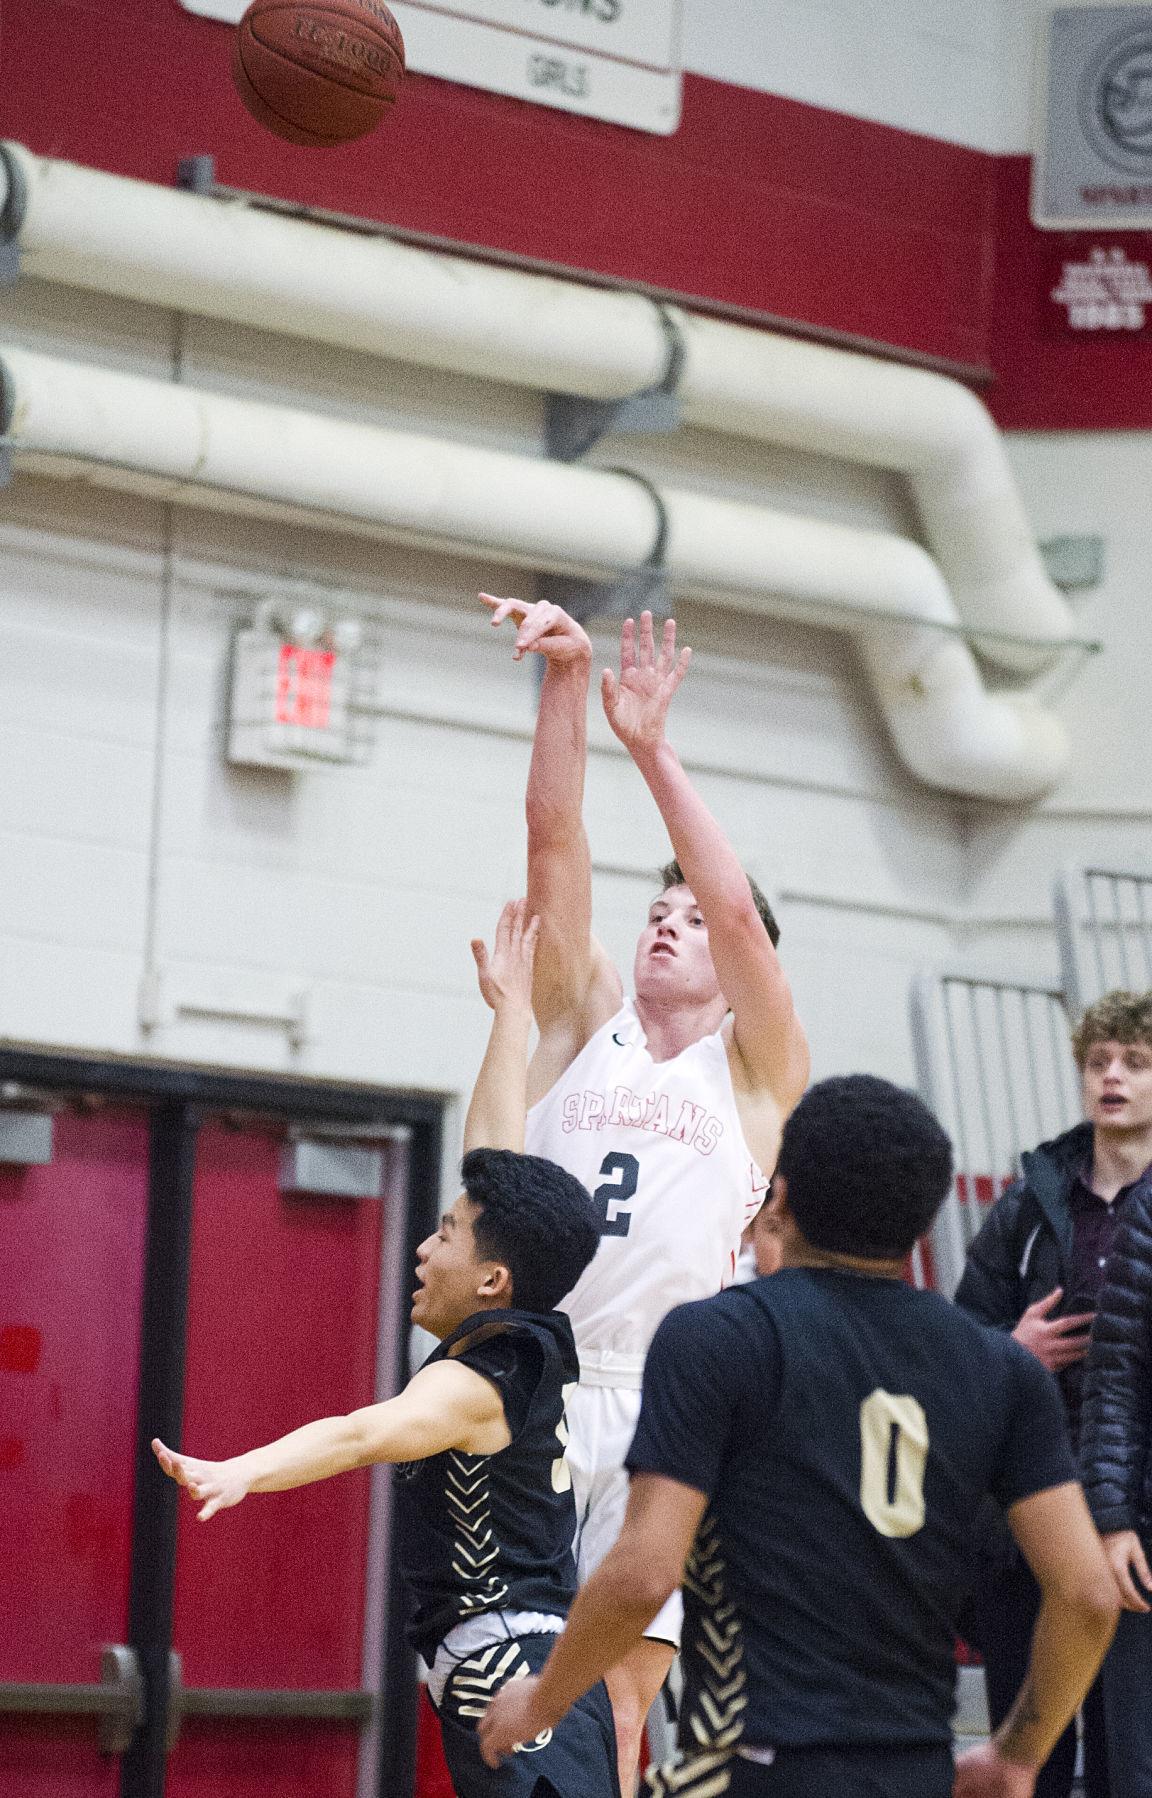 Boys Basketball: Lynnwood at Stanwood, 1.3.20